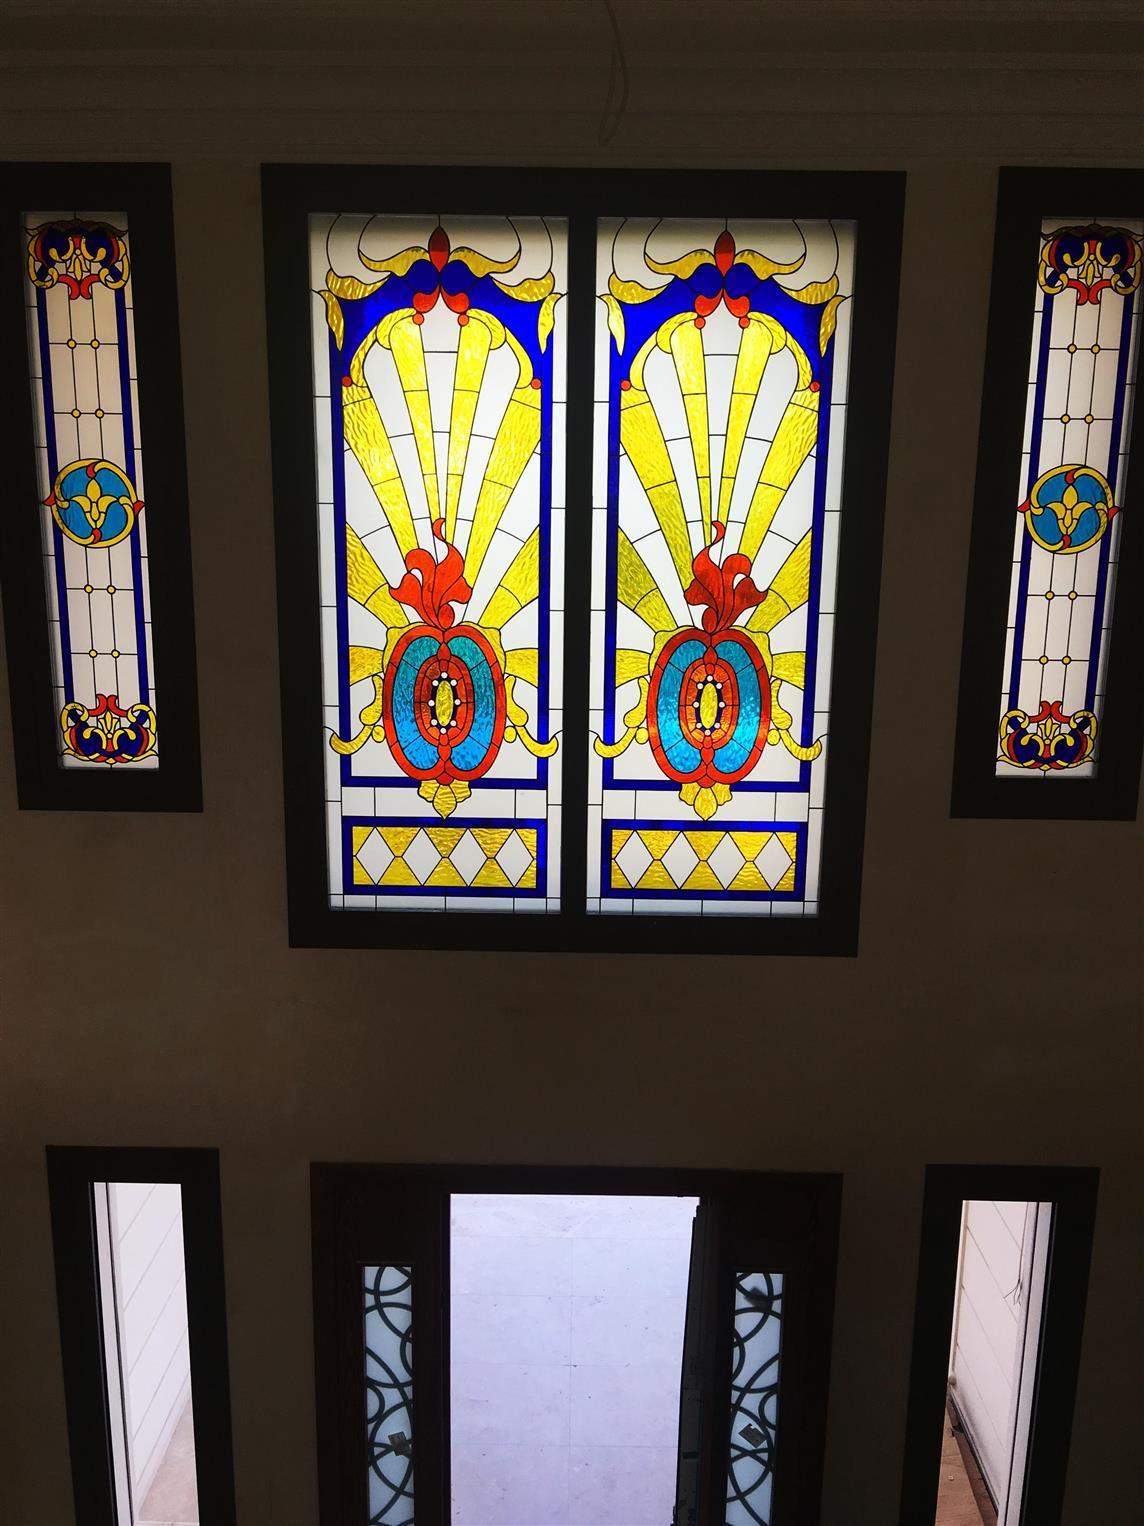 hamam-banyo-tavan-vitraylari20171221185429636.jpg izmir vitray çalışması